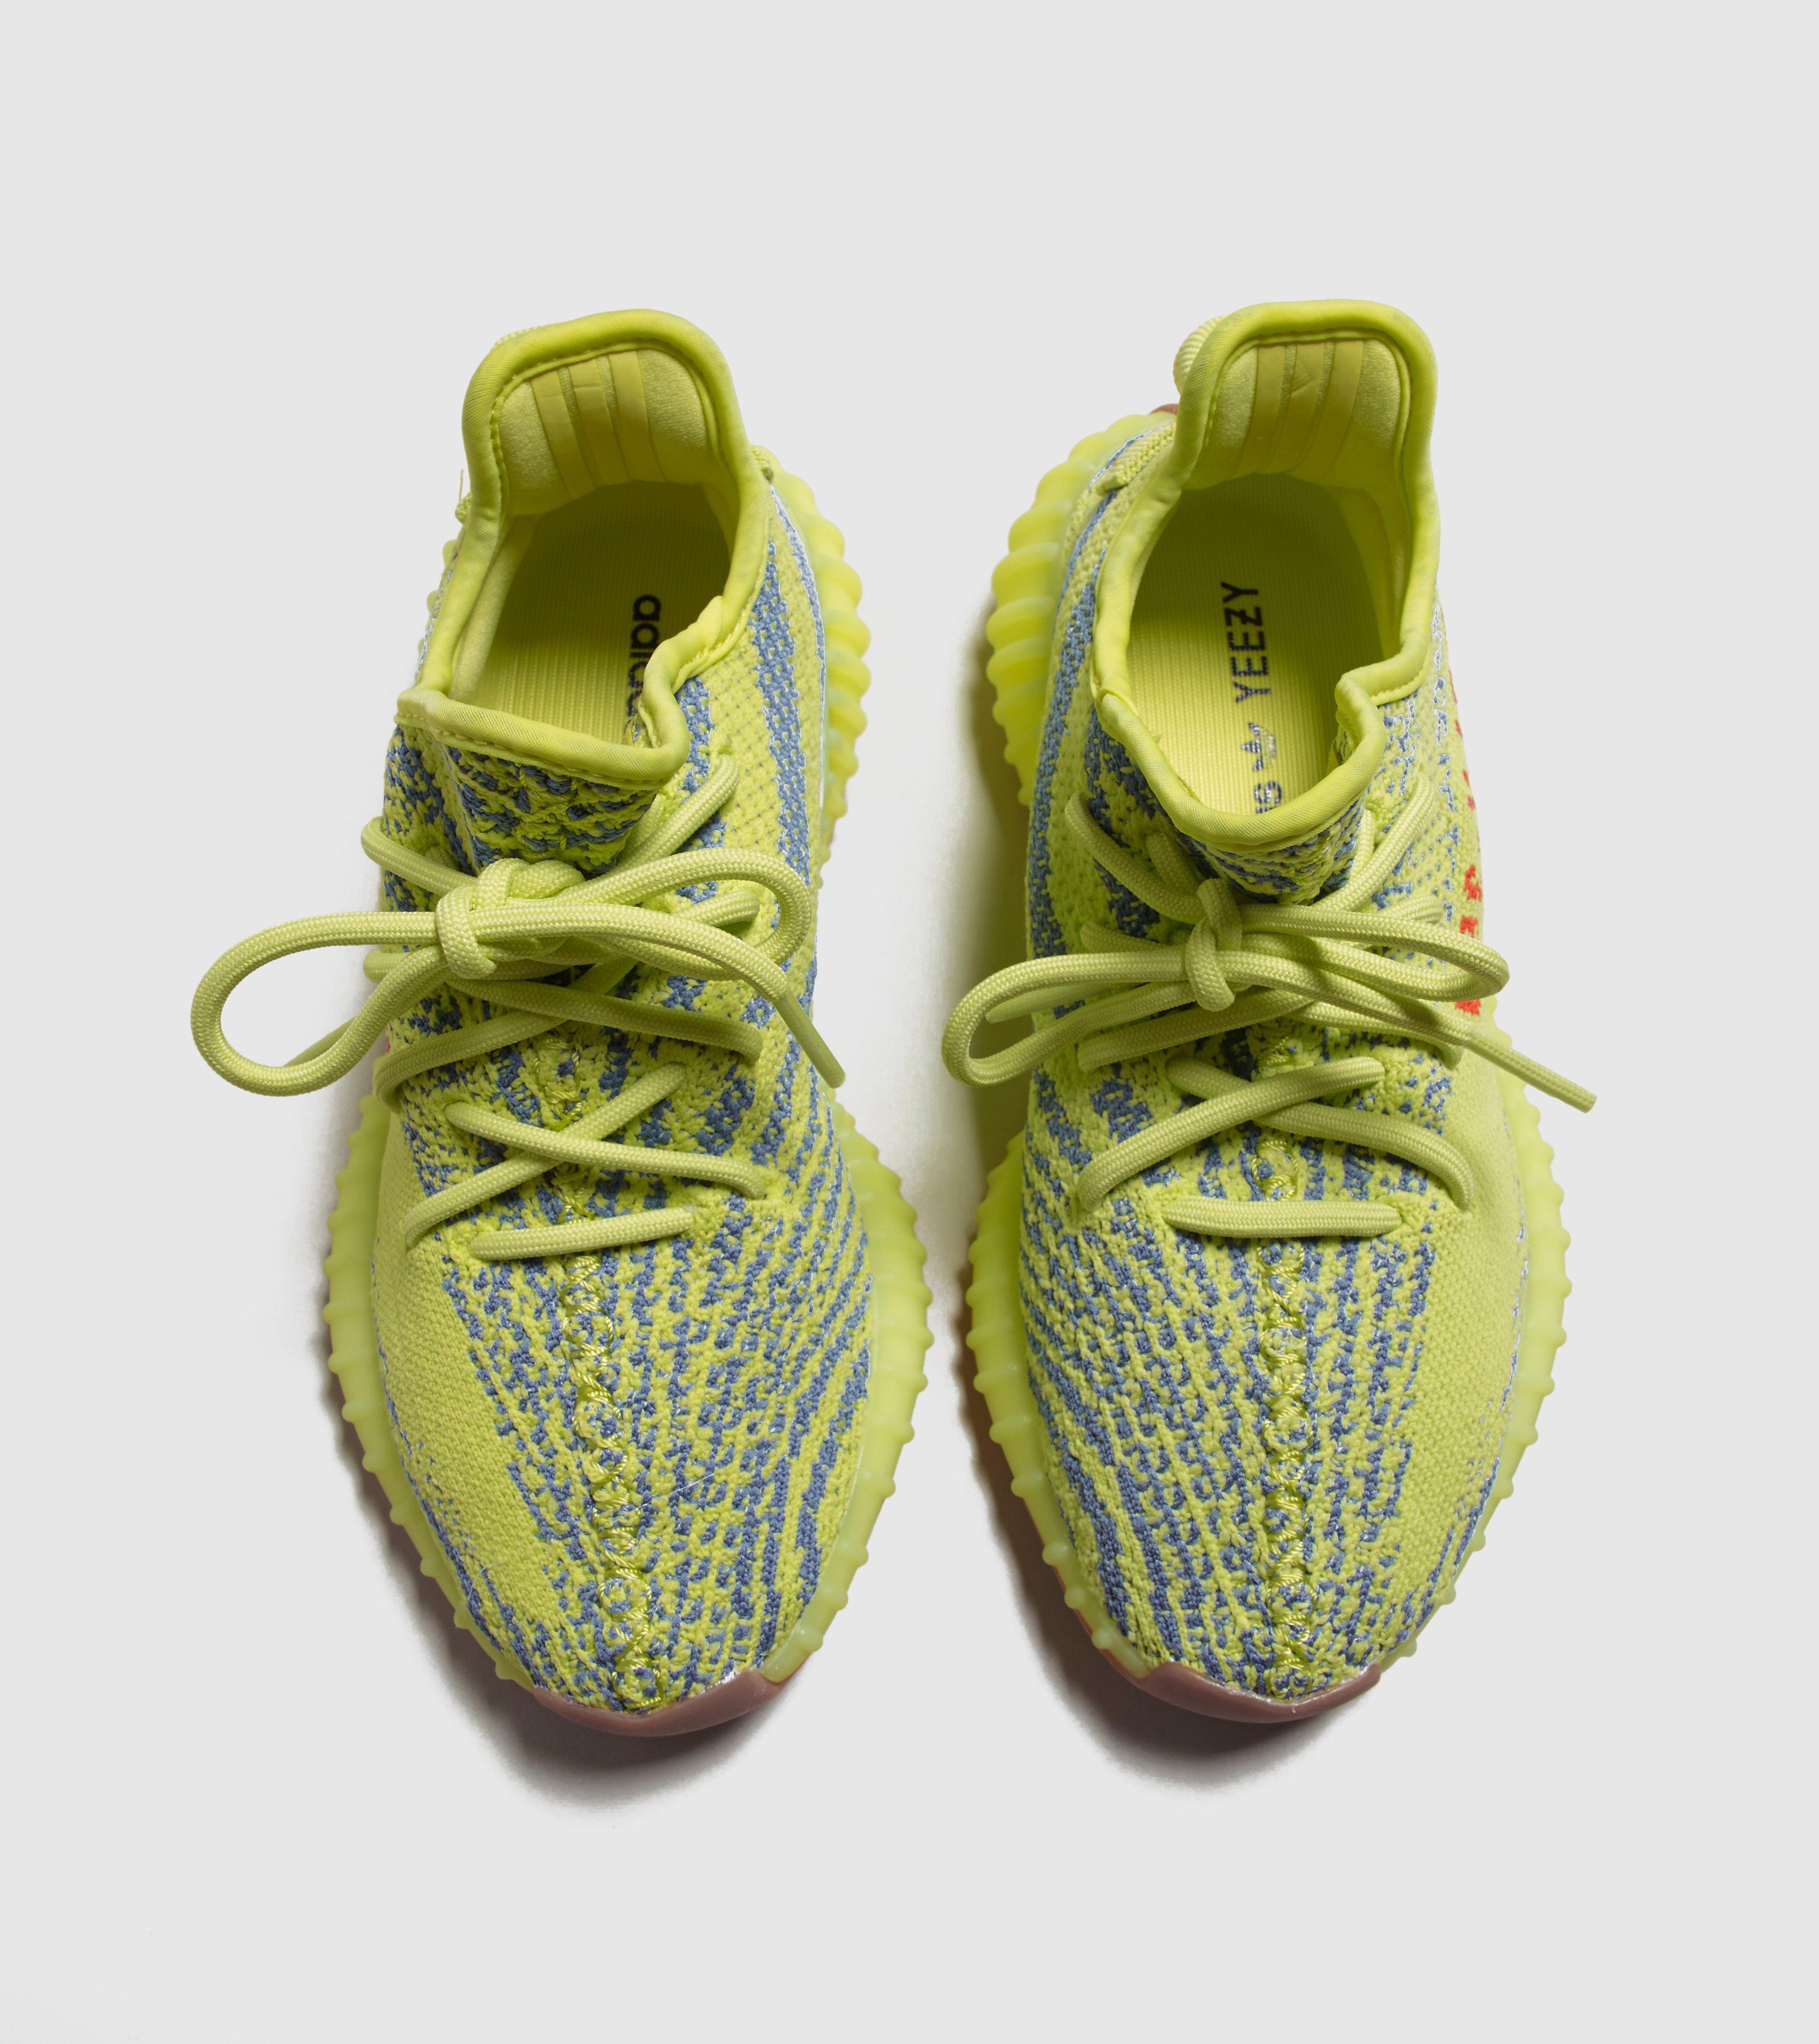 6d0f209283c Lyst - adidas Originals Yeezy Boost 350 V2 Women s in Yellow